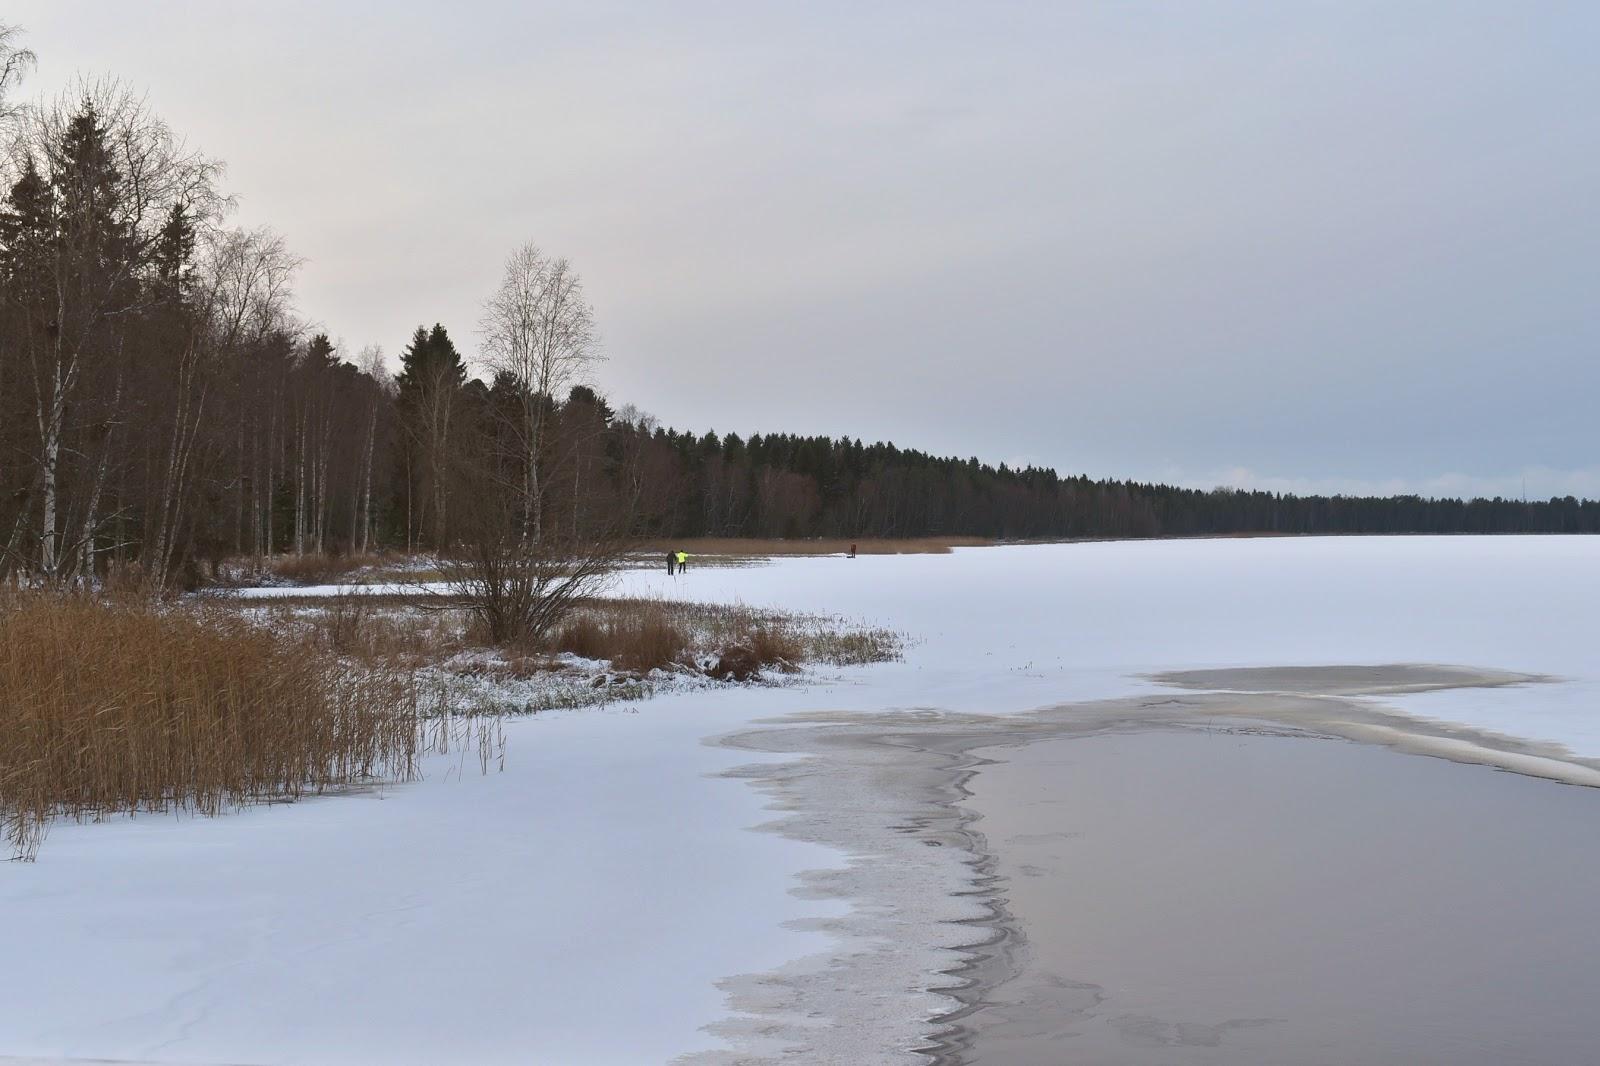 lago congelado, finlandia, inverno